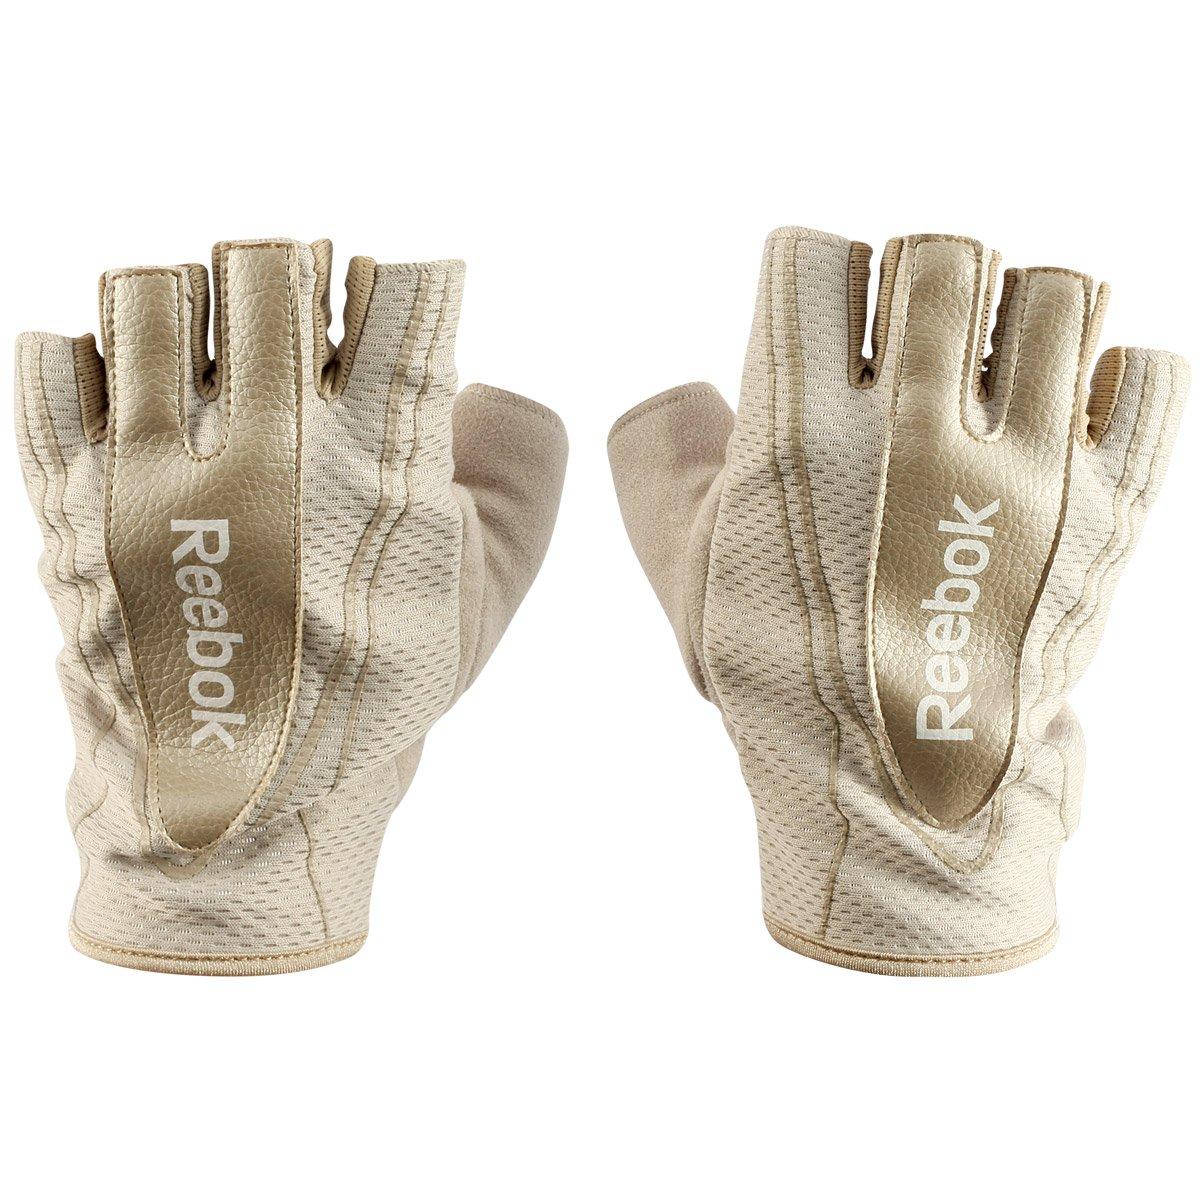 985b72e400b Luva Reebok Ladies Gloves - Compre Agora